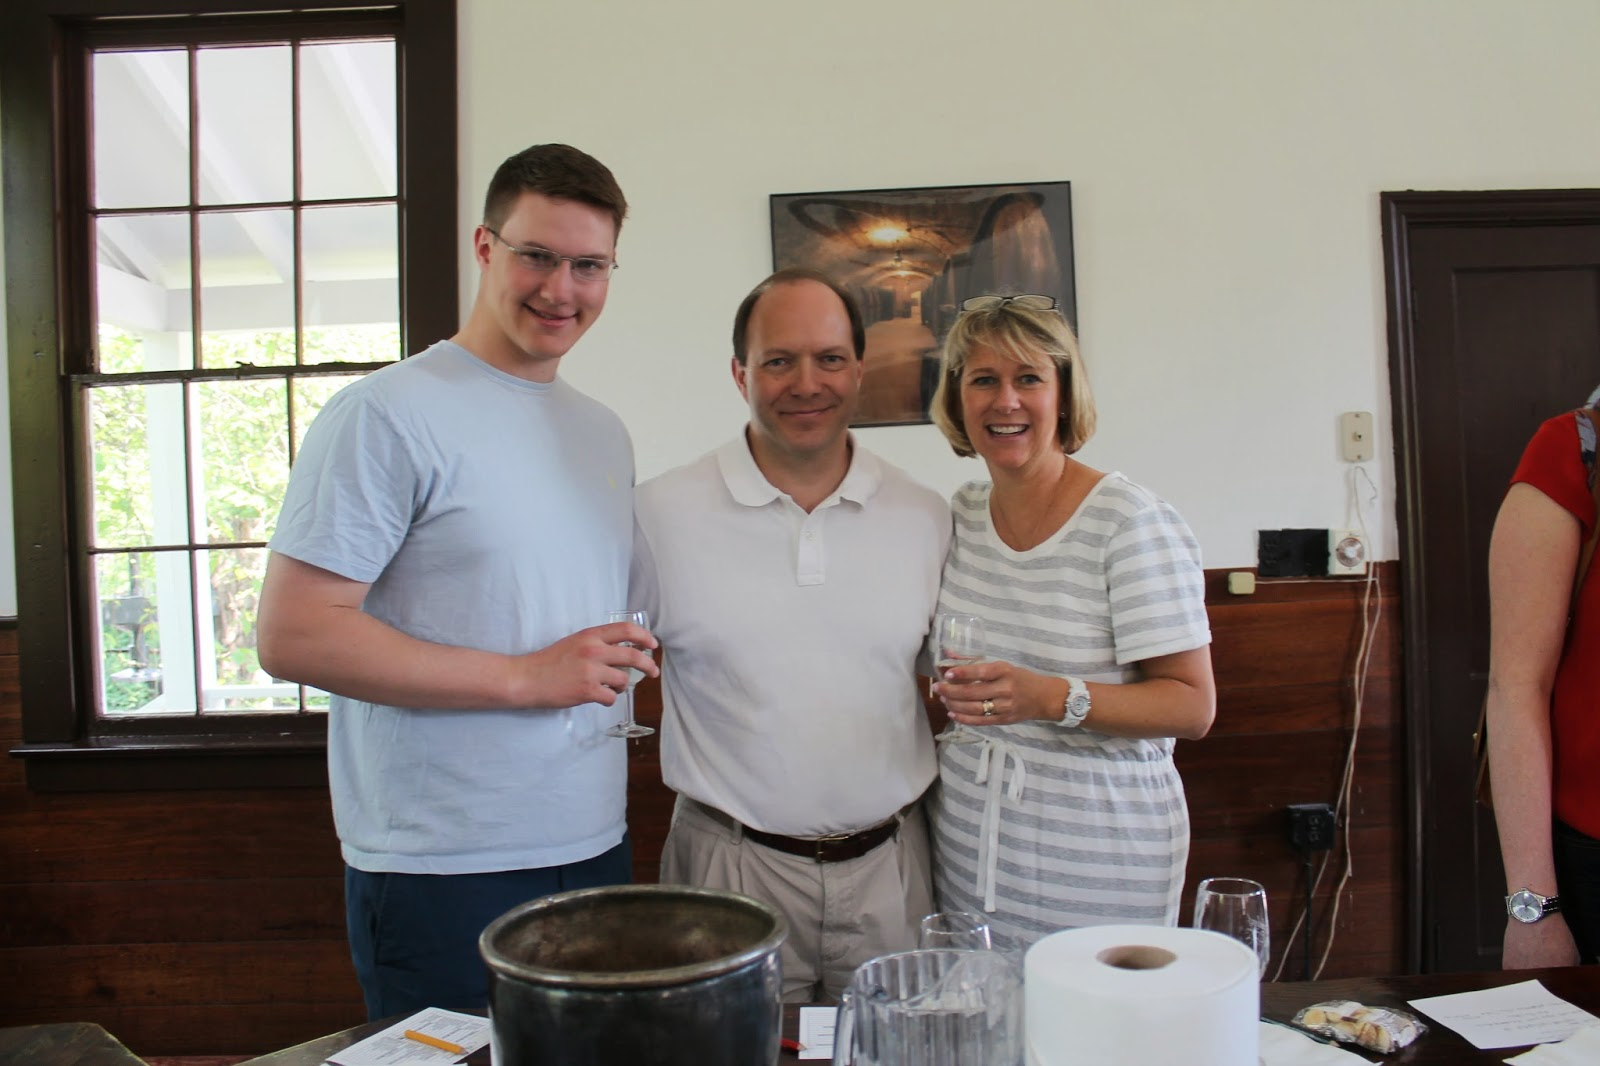 Brotherhood Winery tasting room - Winey Mom, Hubs and Son